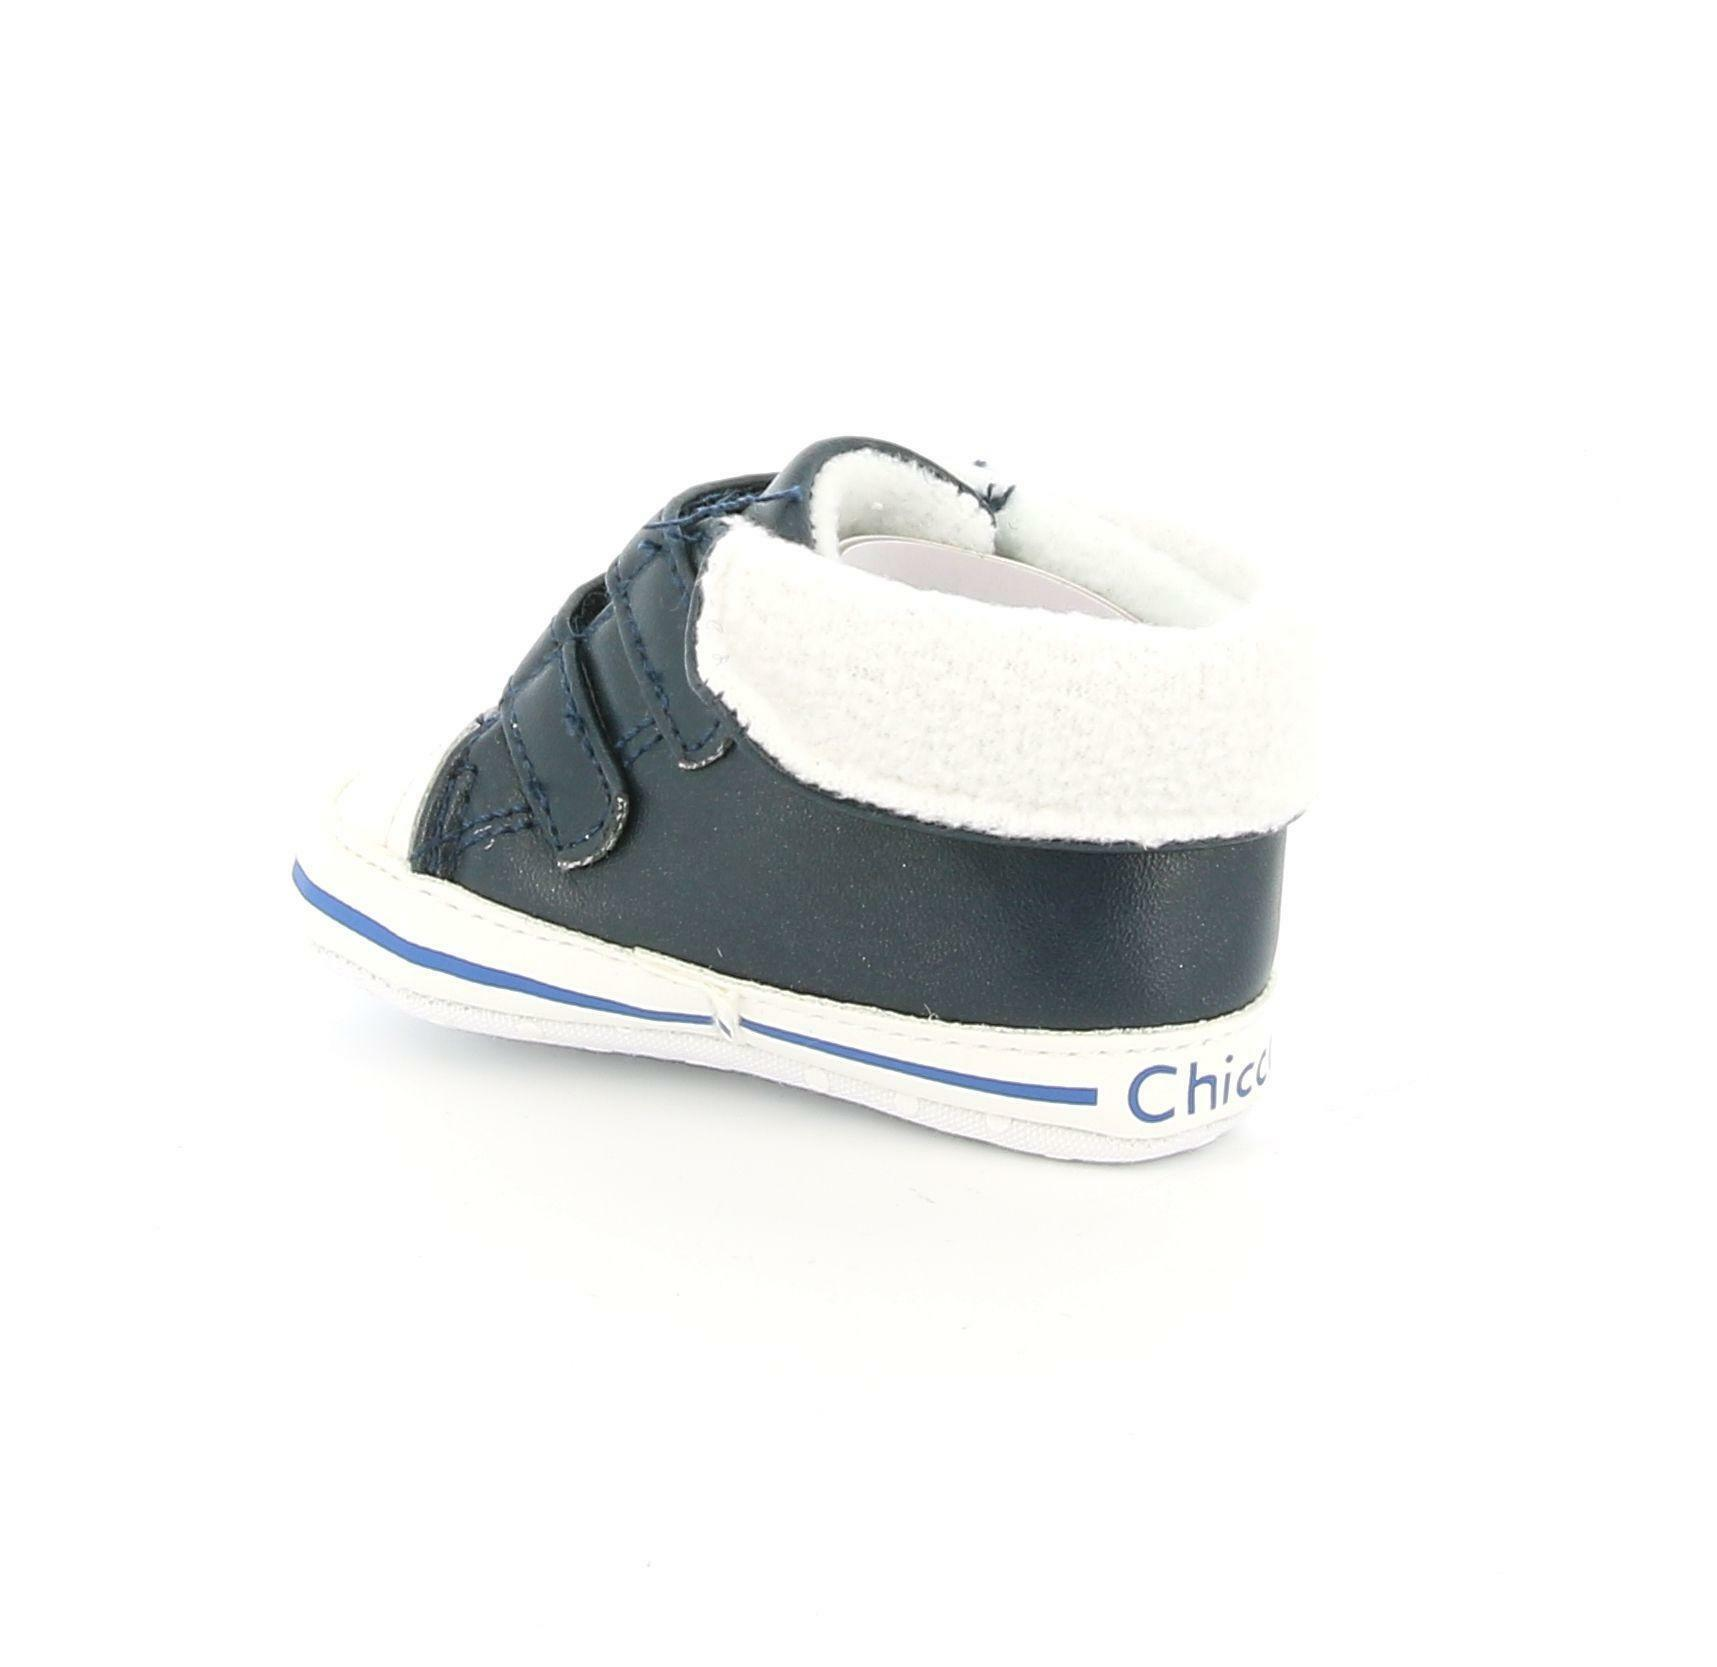 chicco chicco culla 64122 blu sneakers bimbo